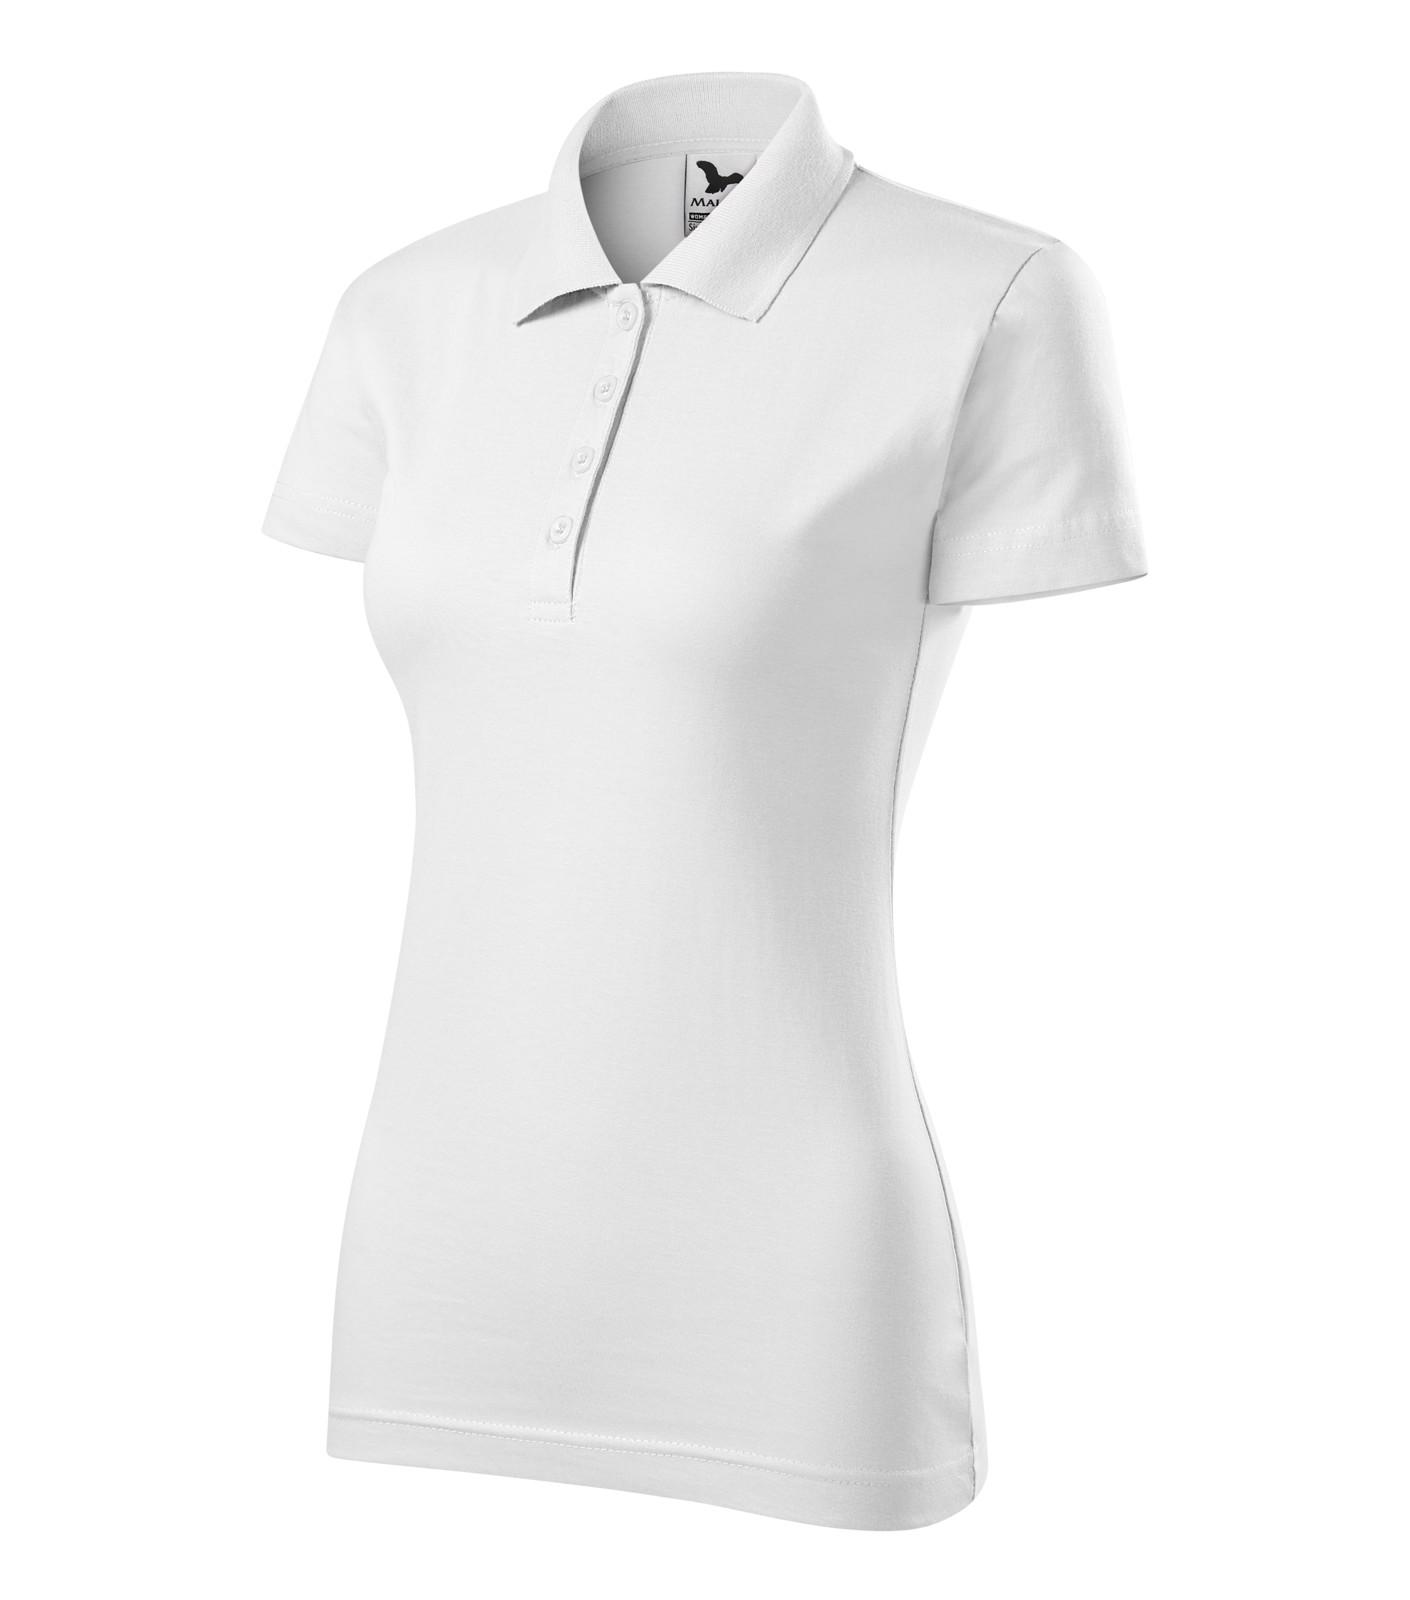 Polo Shirt women's Malfini Single J. - White / XS